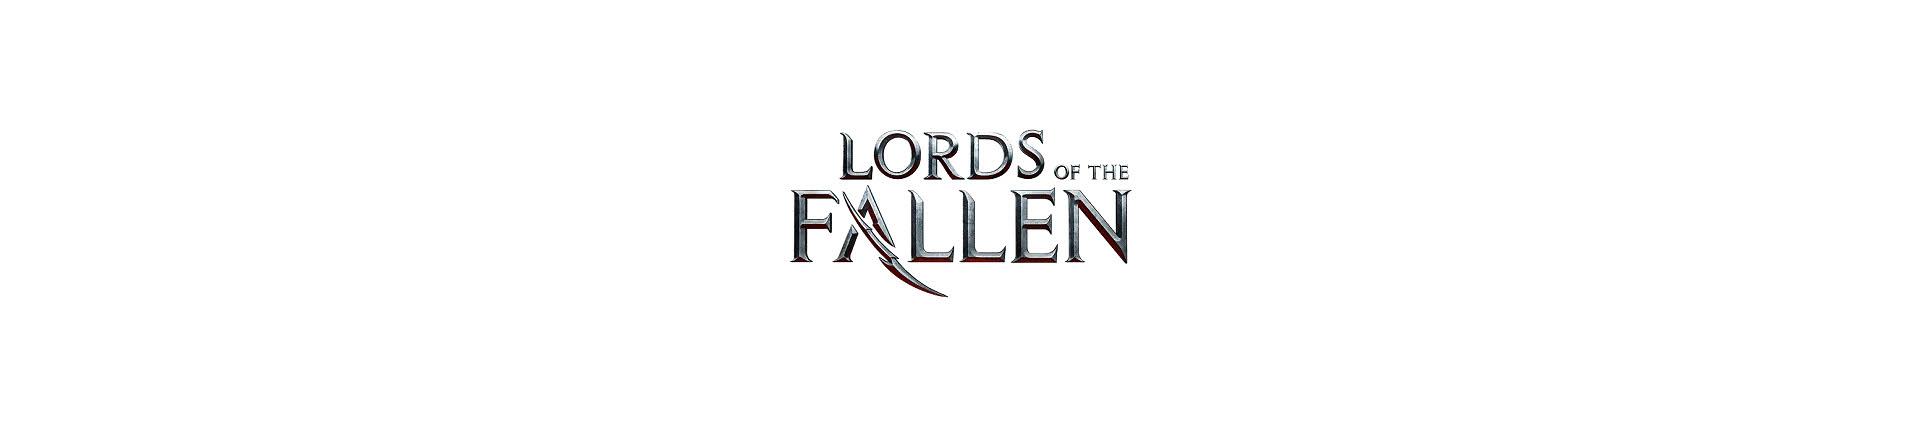 <a href='https://www.mightygamesmag.de/all-game-list/lords-of-the-fallen/'>Zum Spiel</a>